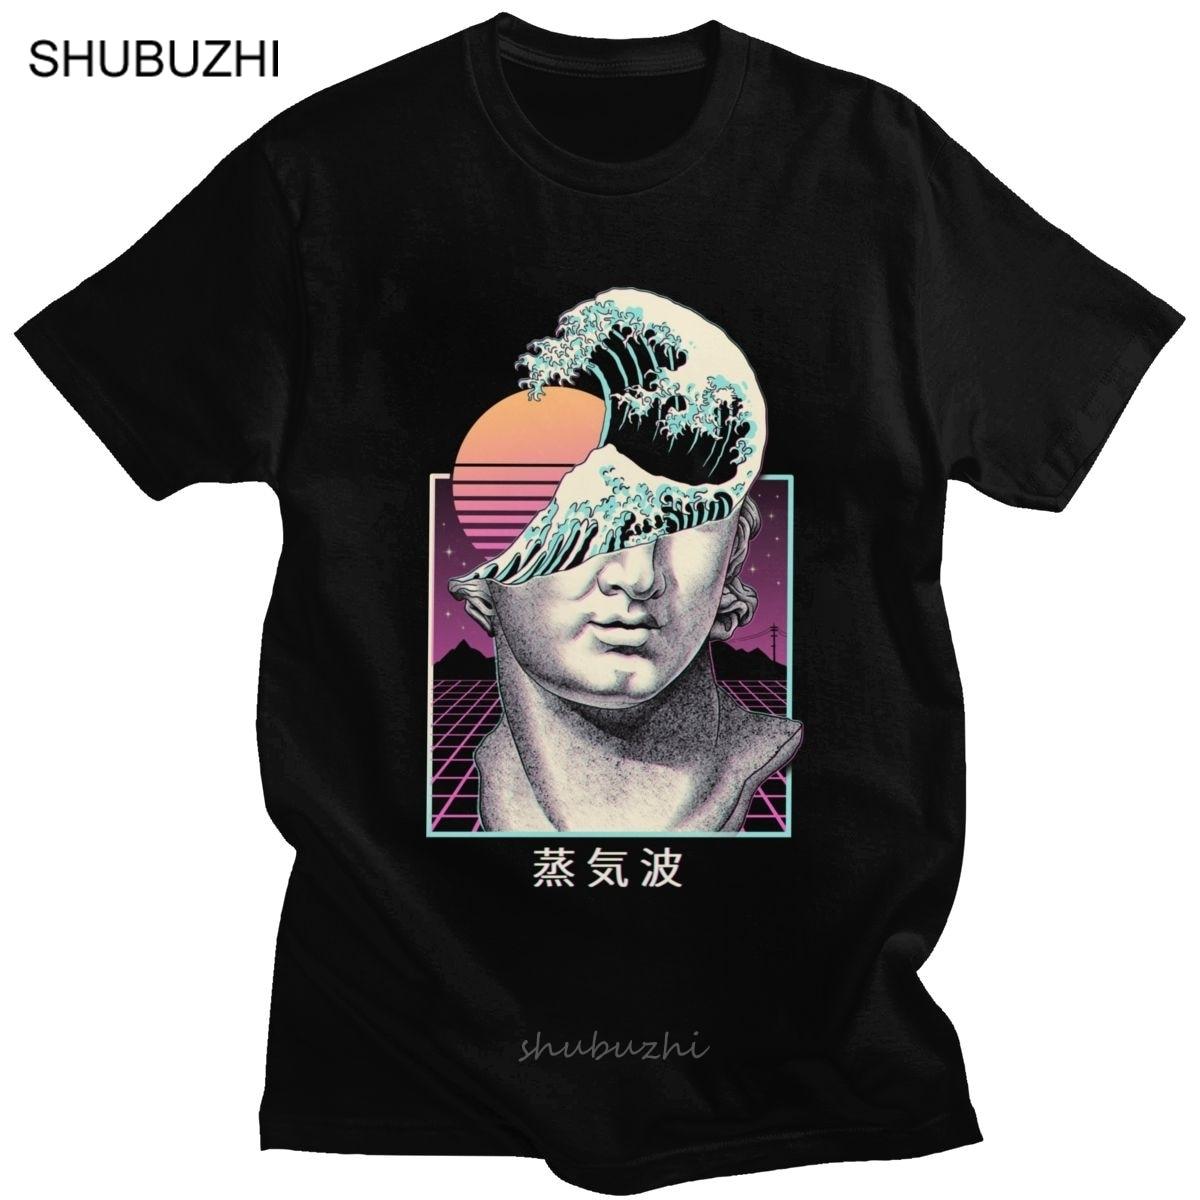 T-shirts de manga curta t camisa de manga curta camisa de manga curta t camisa de algodão